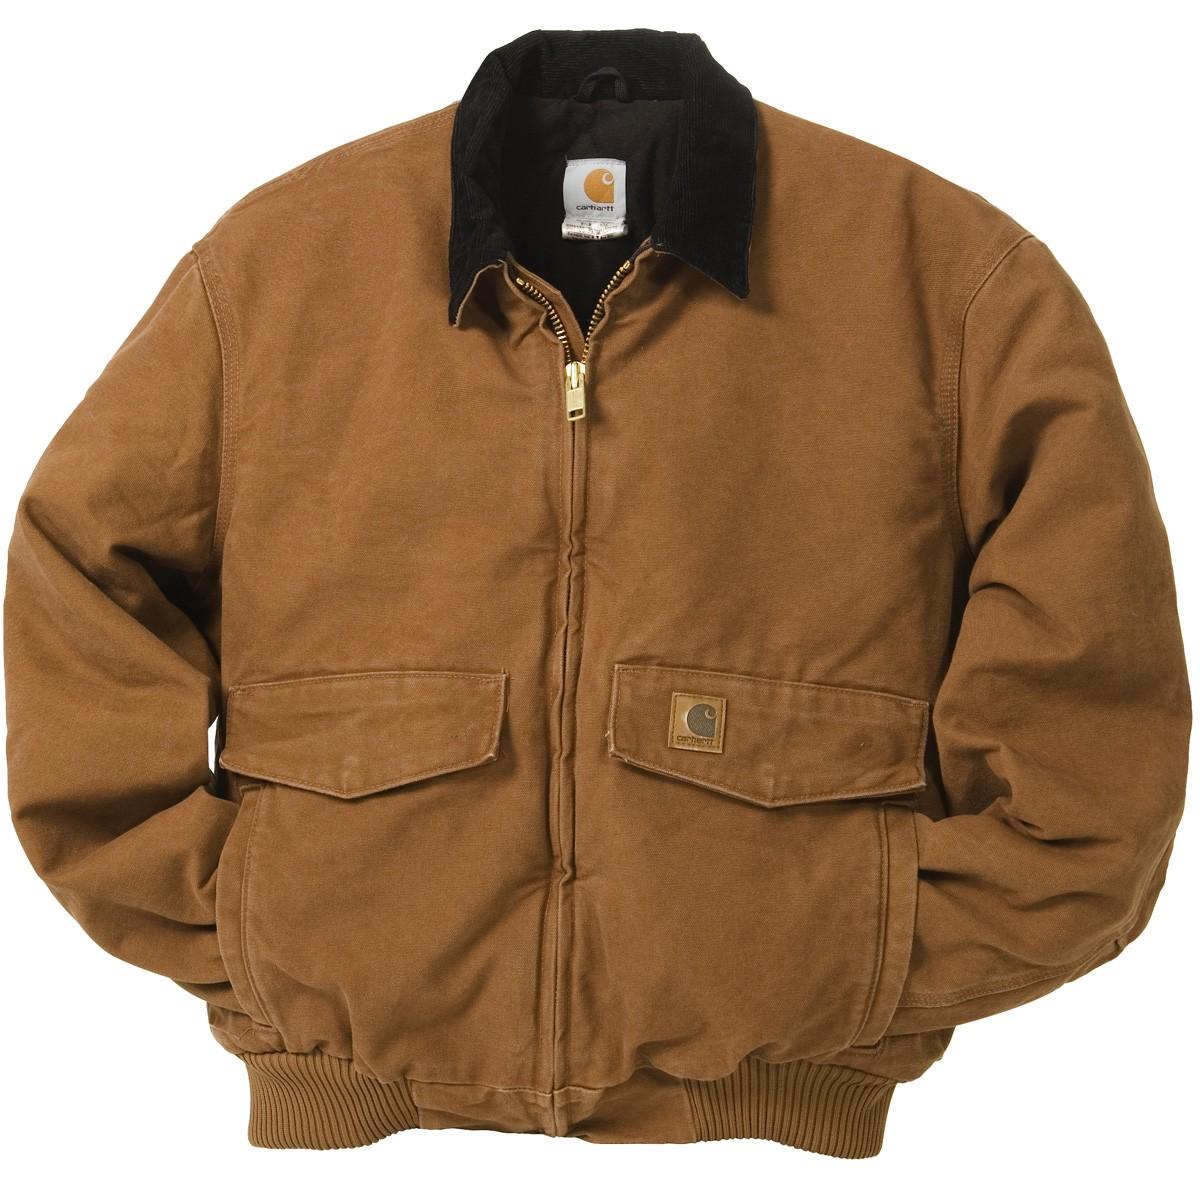 Concealment Jacket-78150.jpg